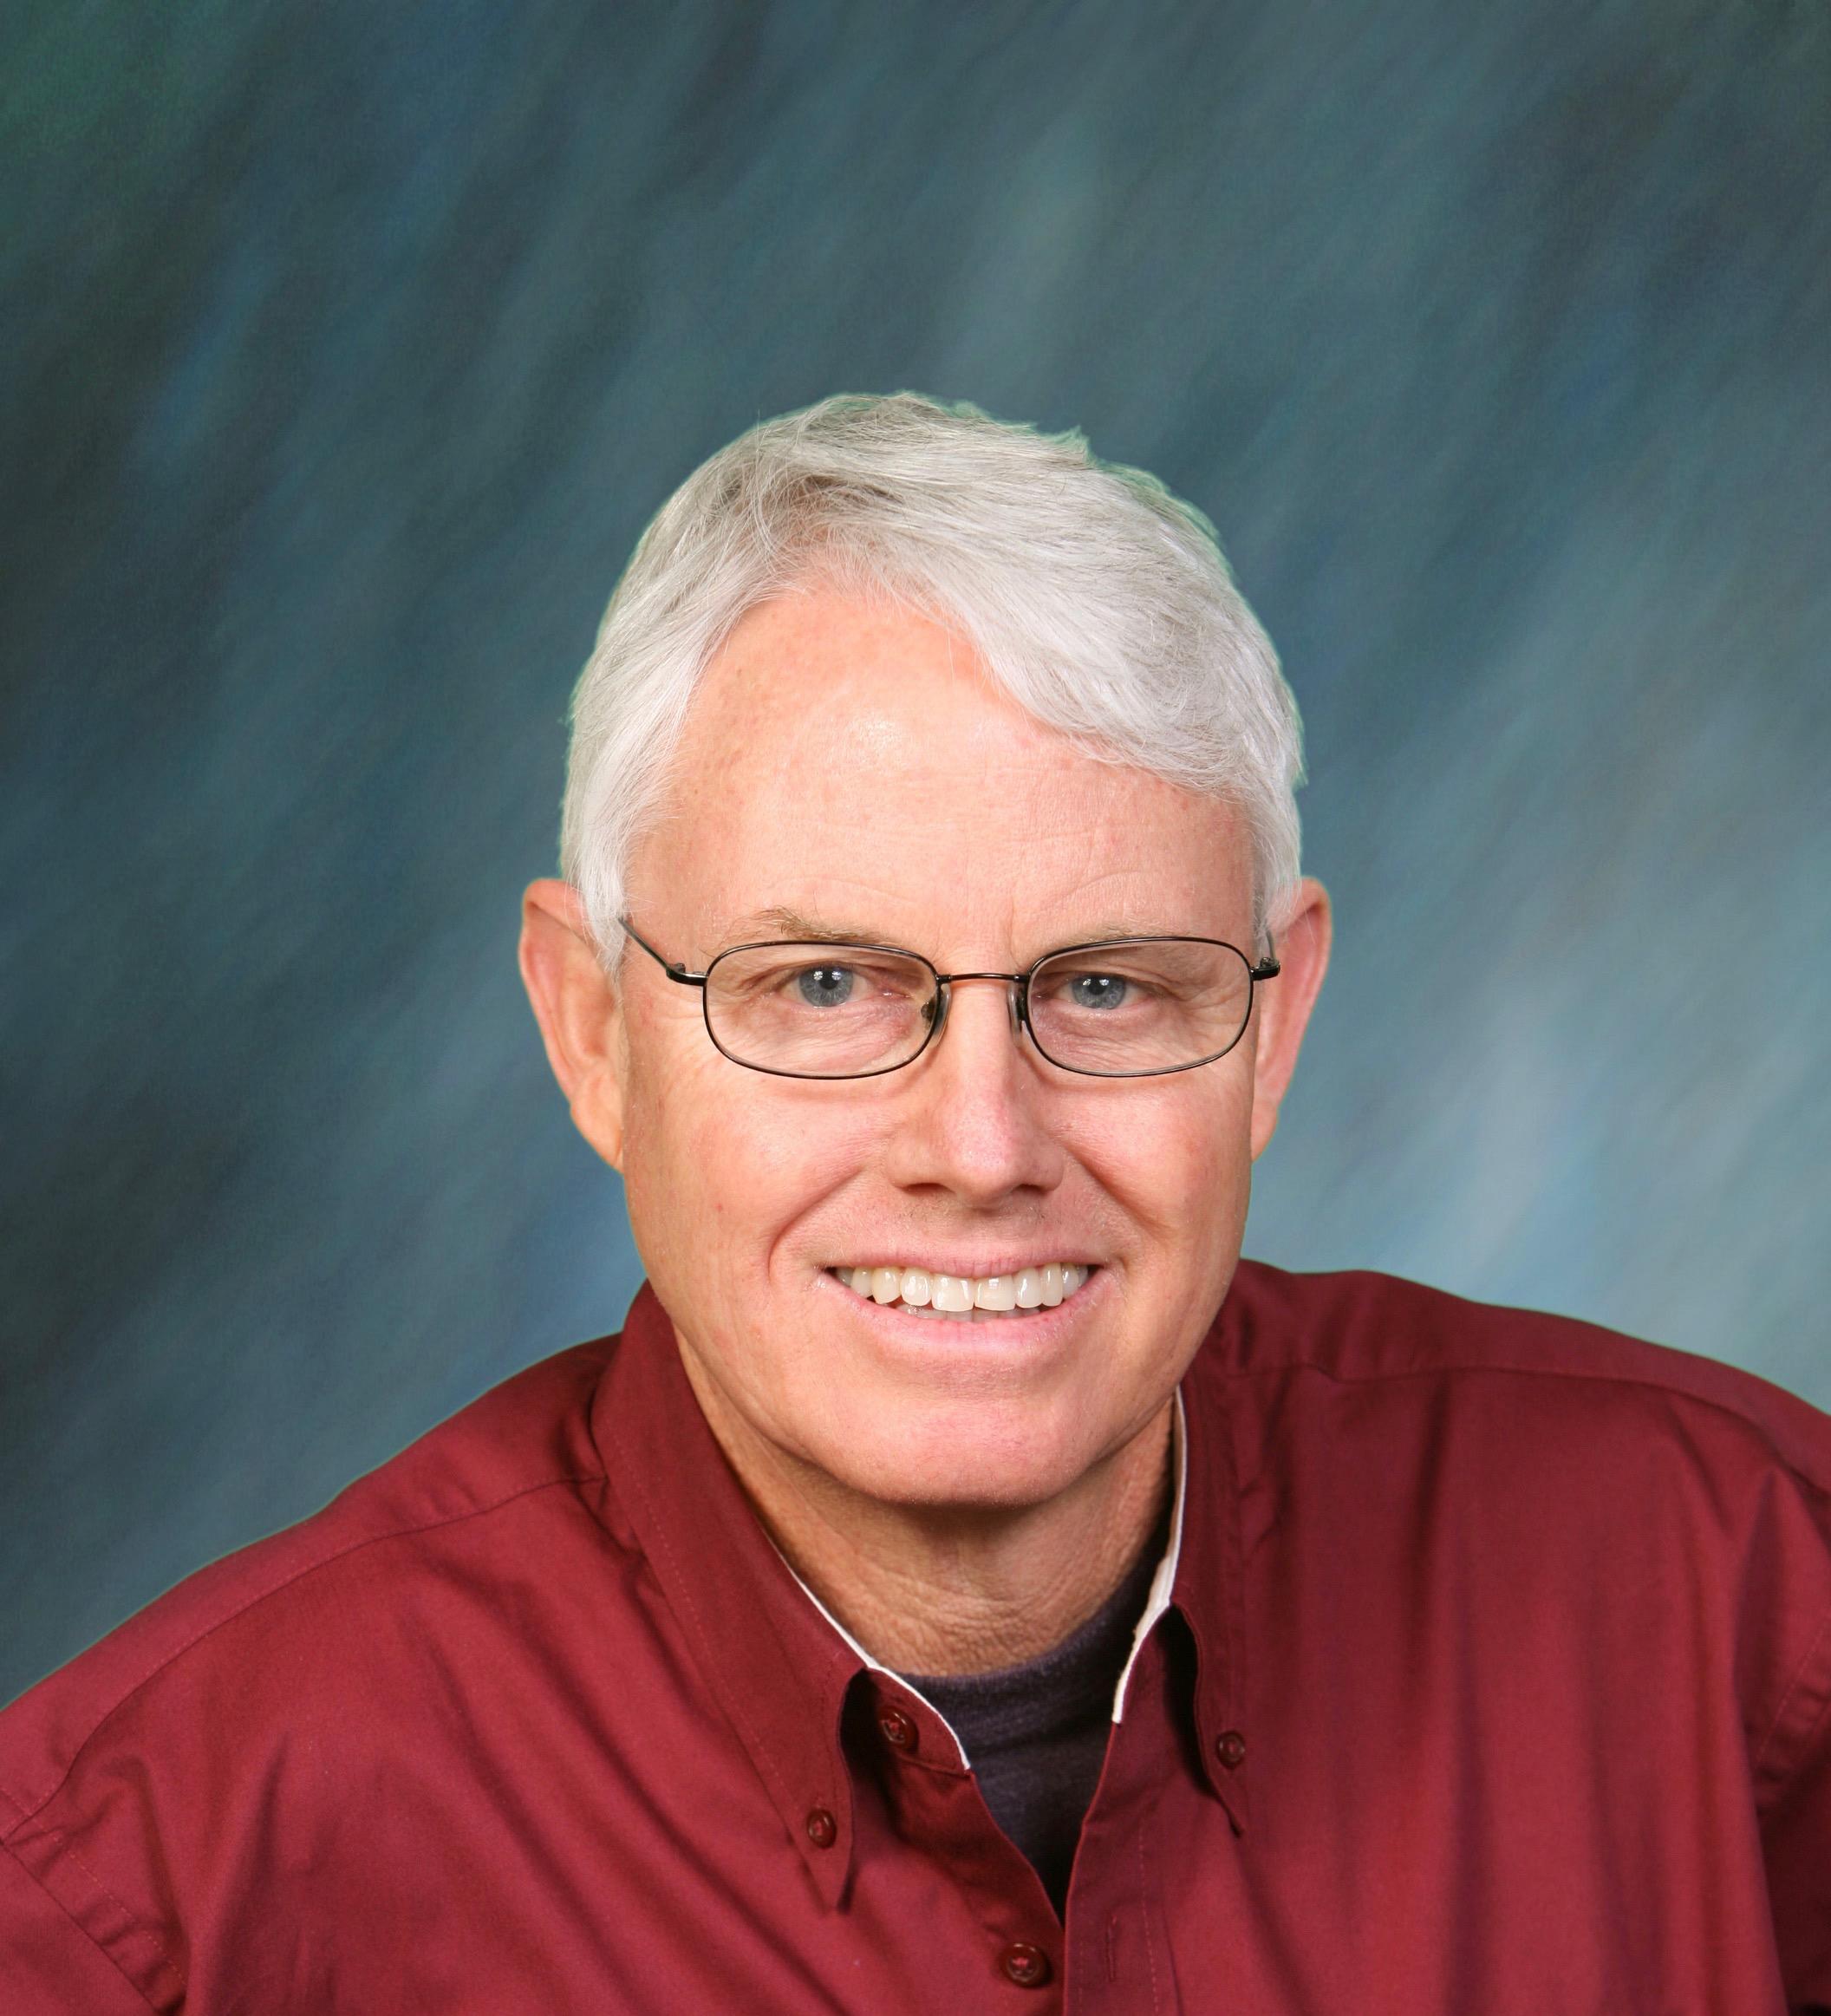 nafb-Patrick-Cavanaugh-California Ag Today Farm News Director